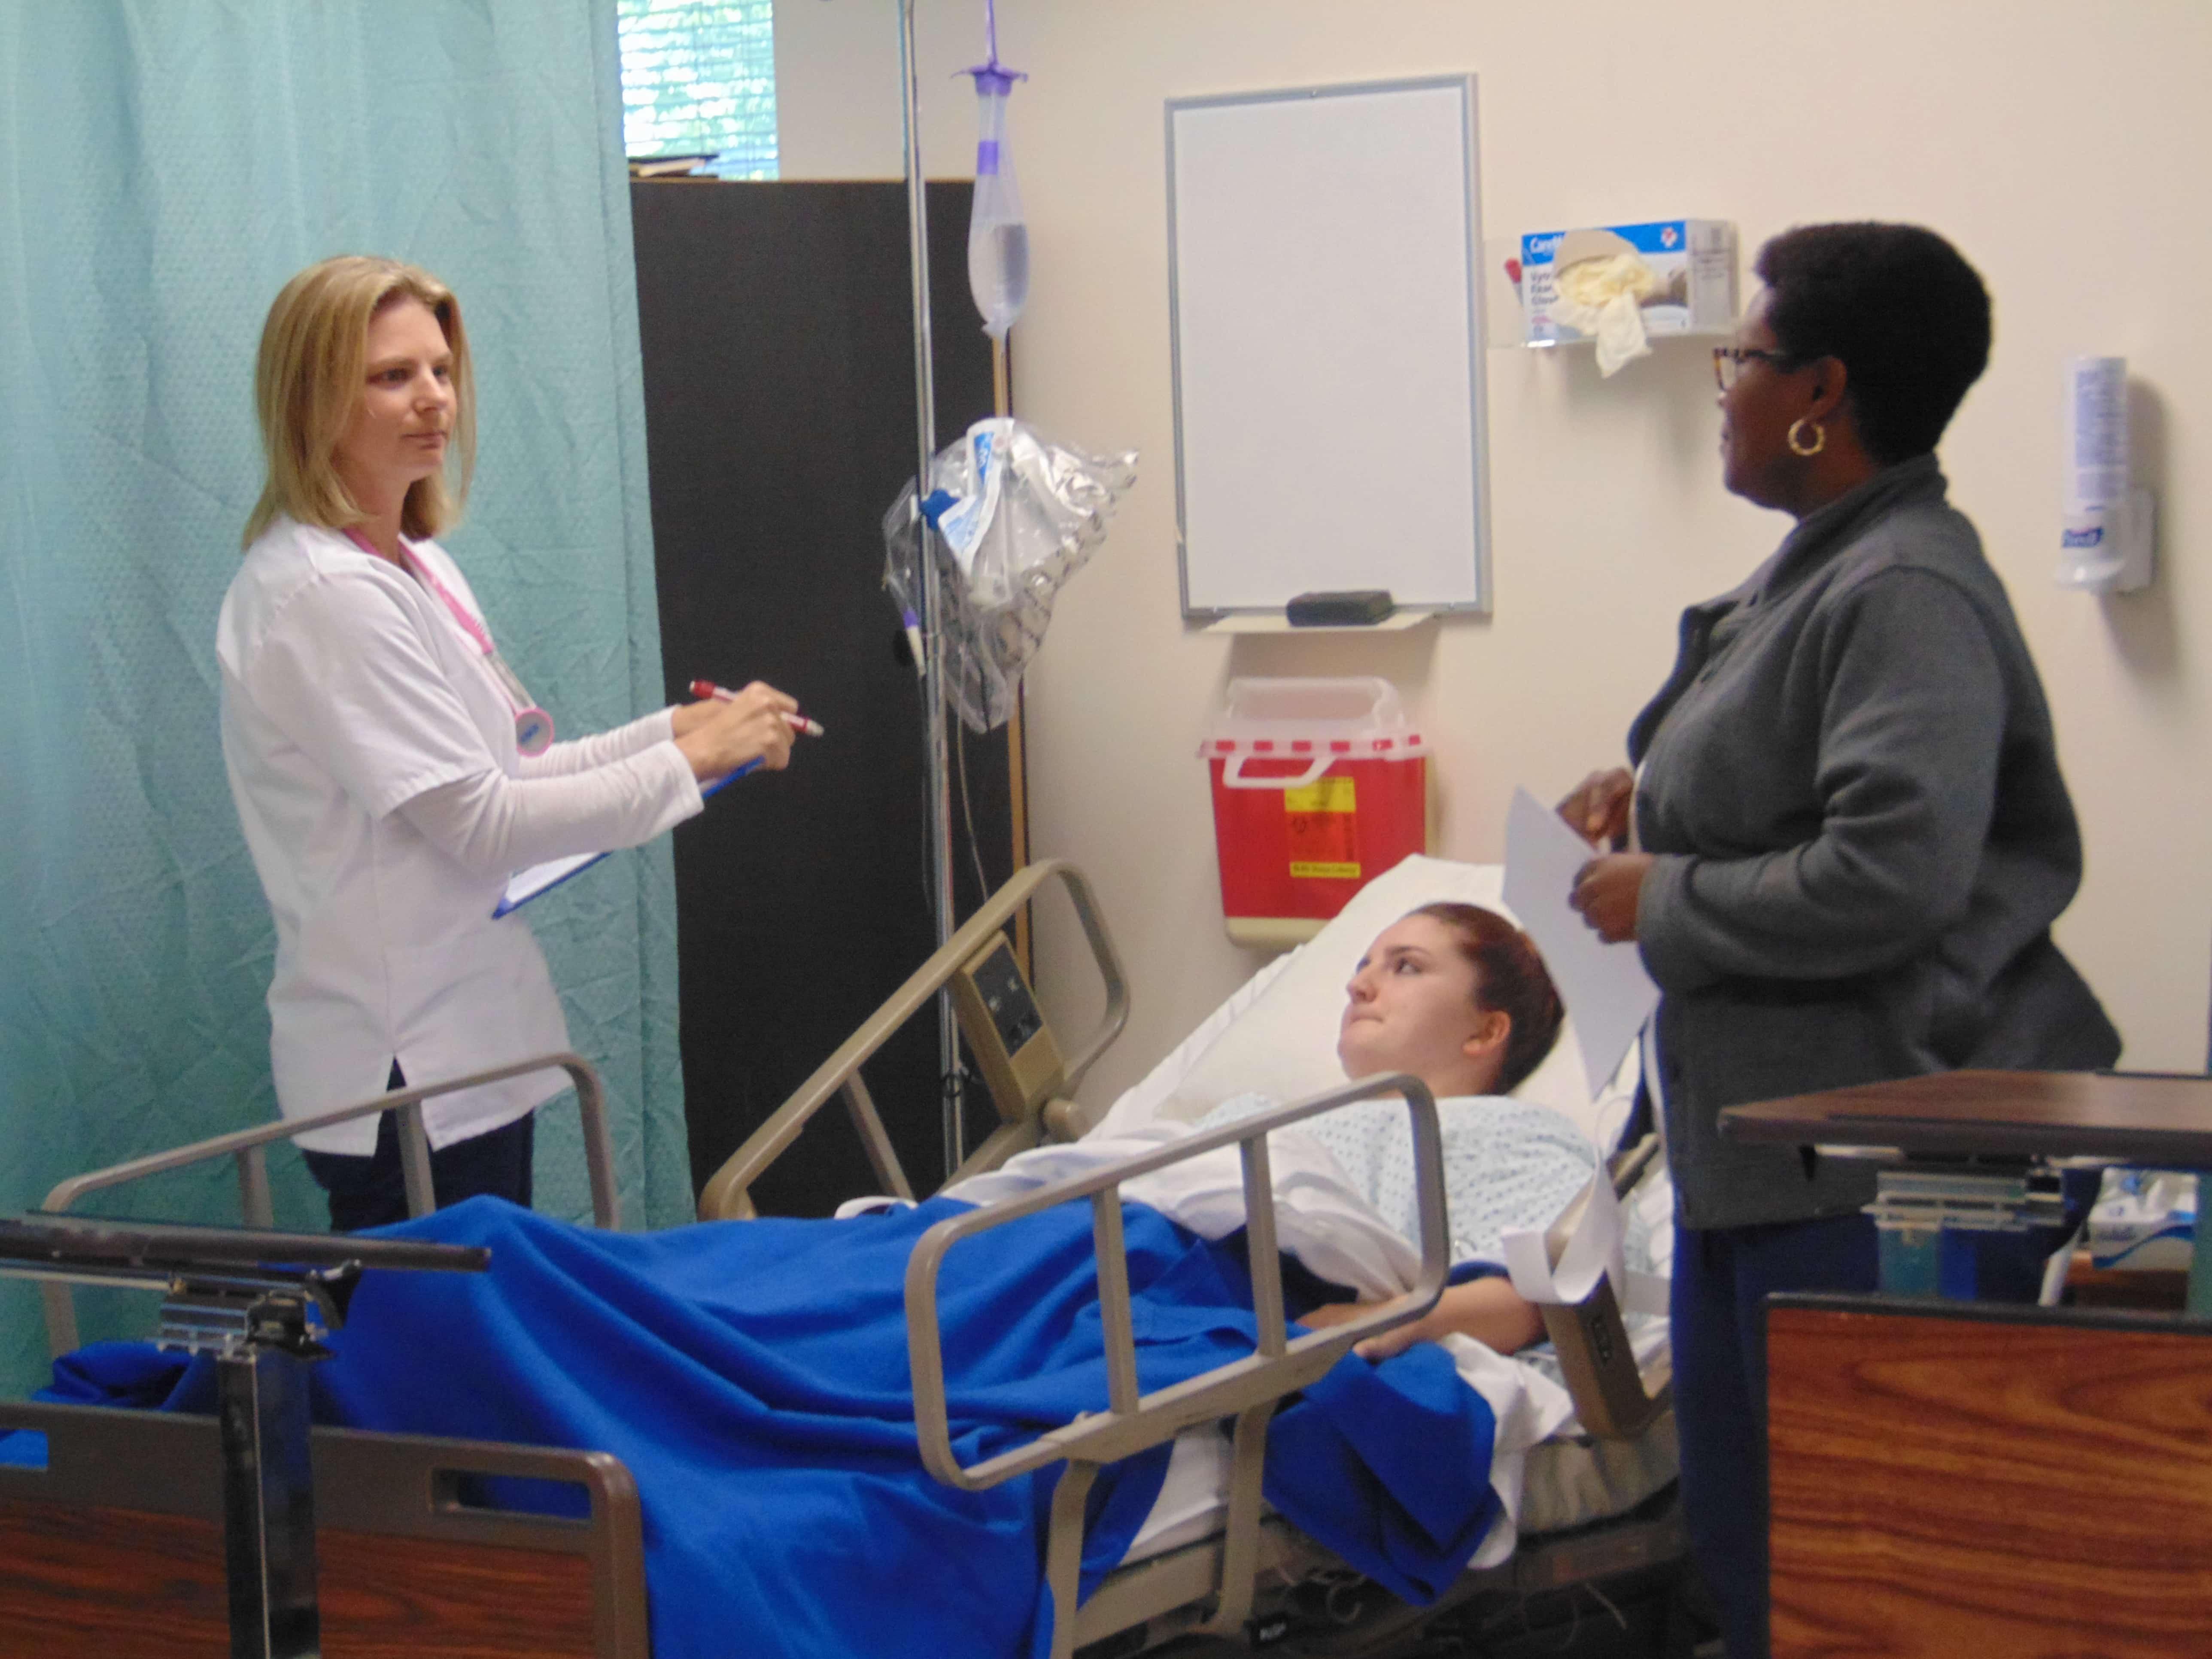 Sarasota Nursing Students Produce Skits on a Variety of Topics